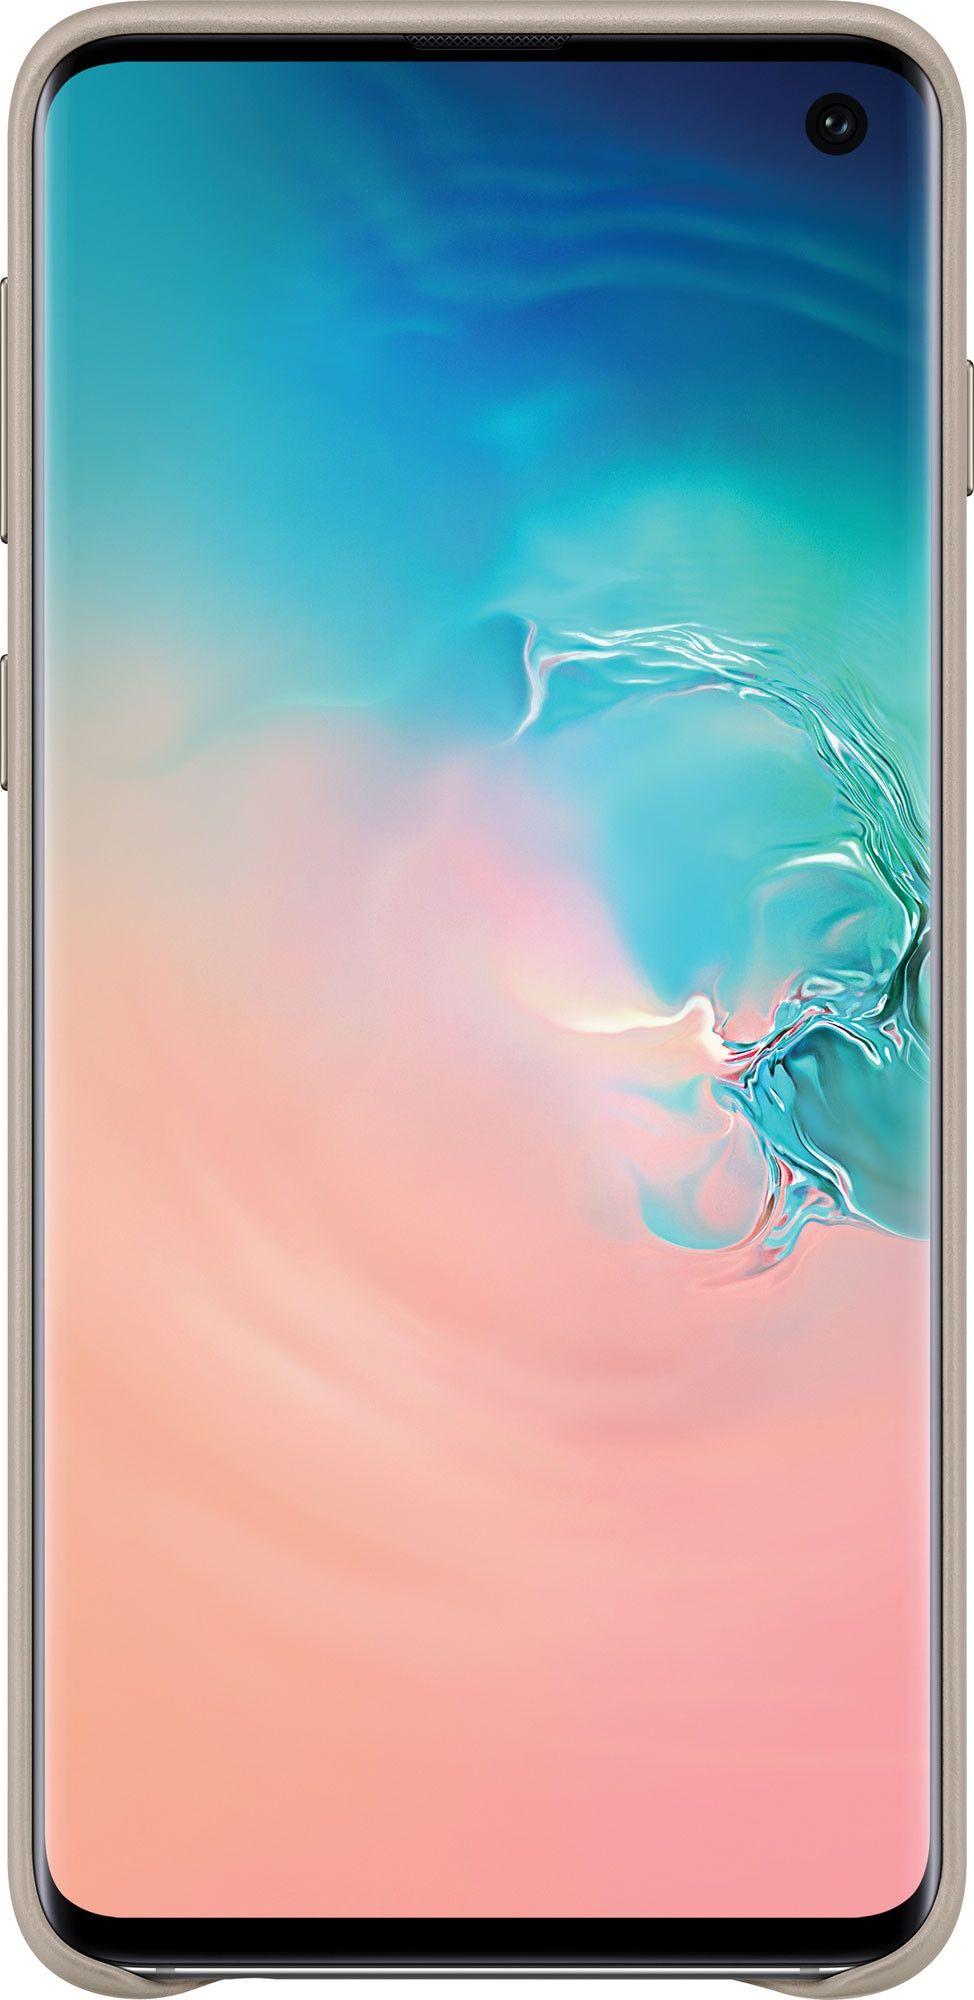 Панель Samsung Leather Cover для Samsung Galaxy S10 (EF-VG973LJEGRU) Gray от Територія твоєї техніки - 2